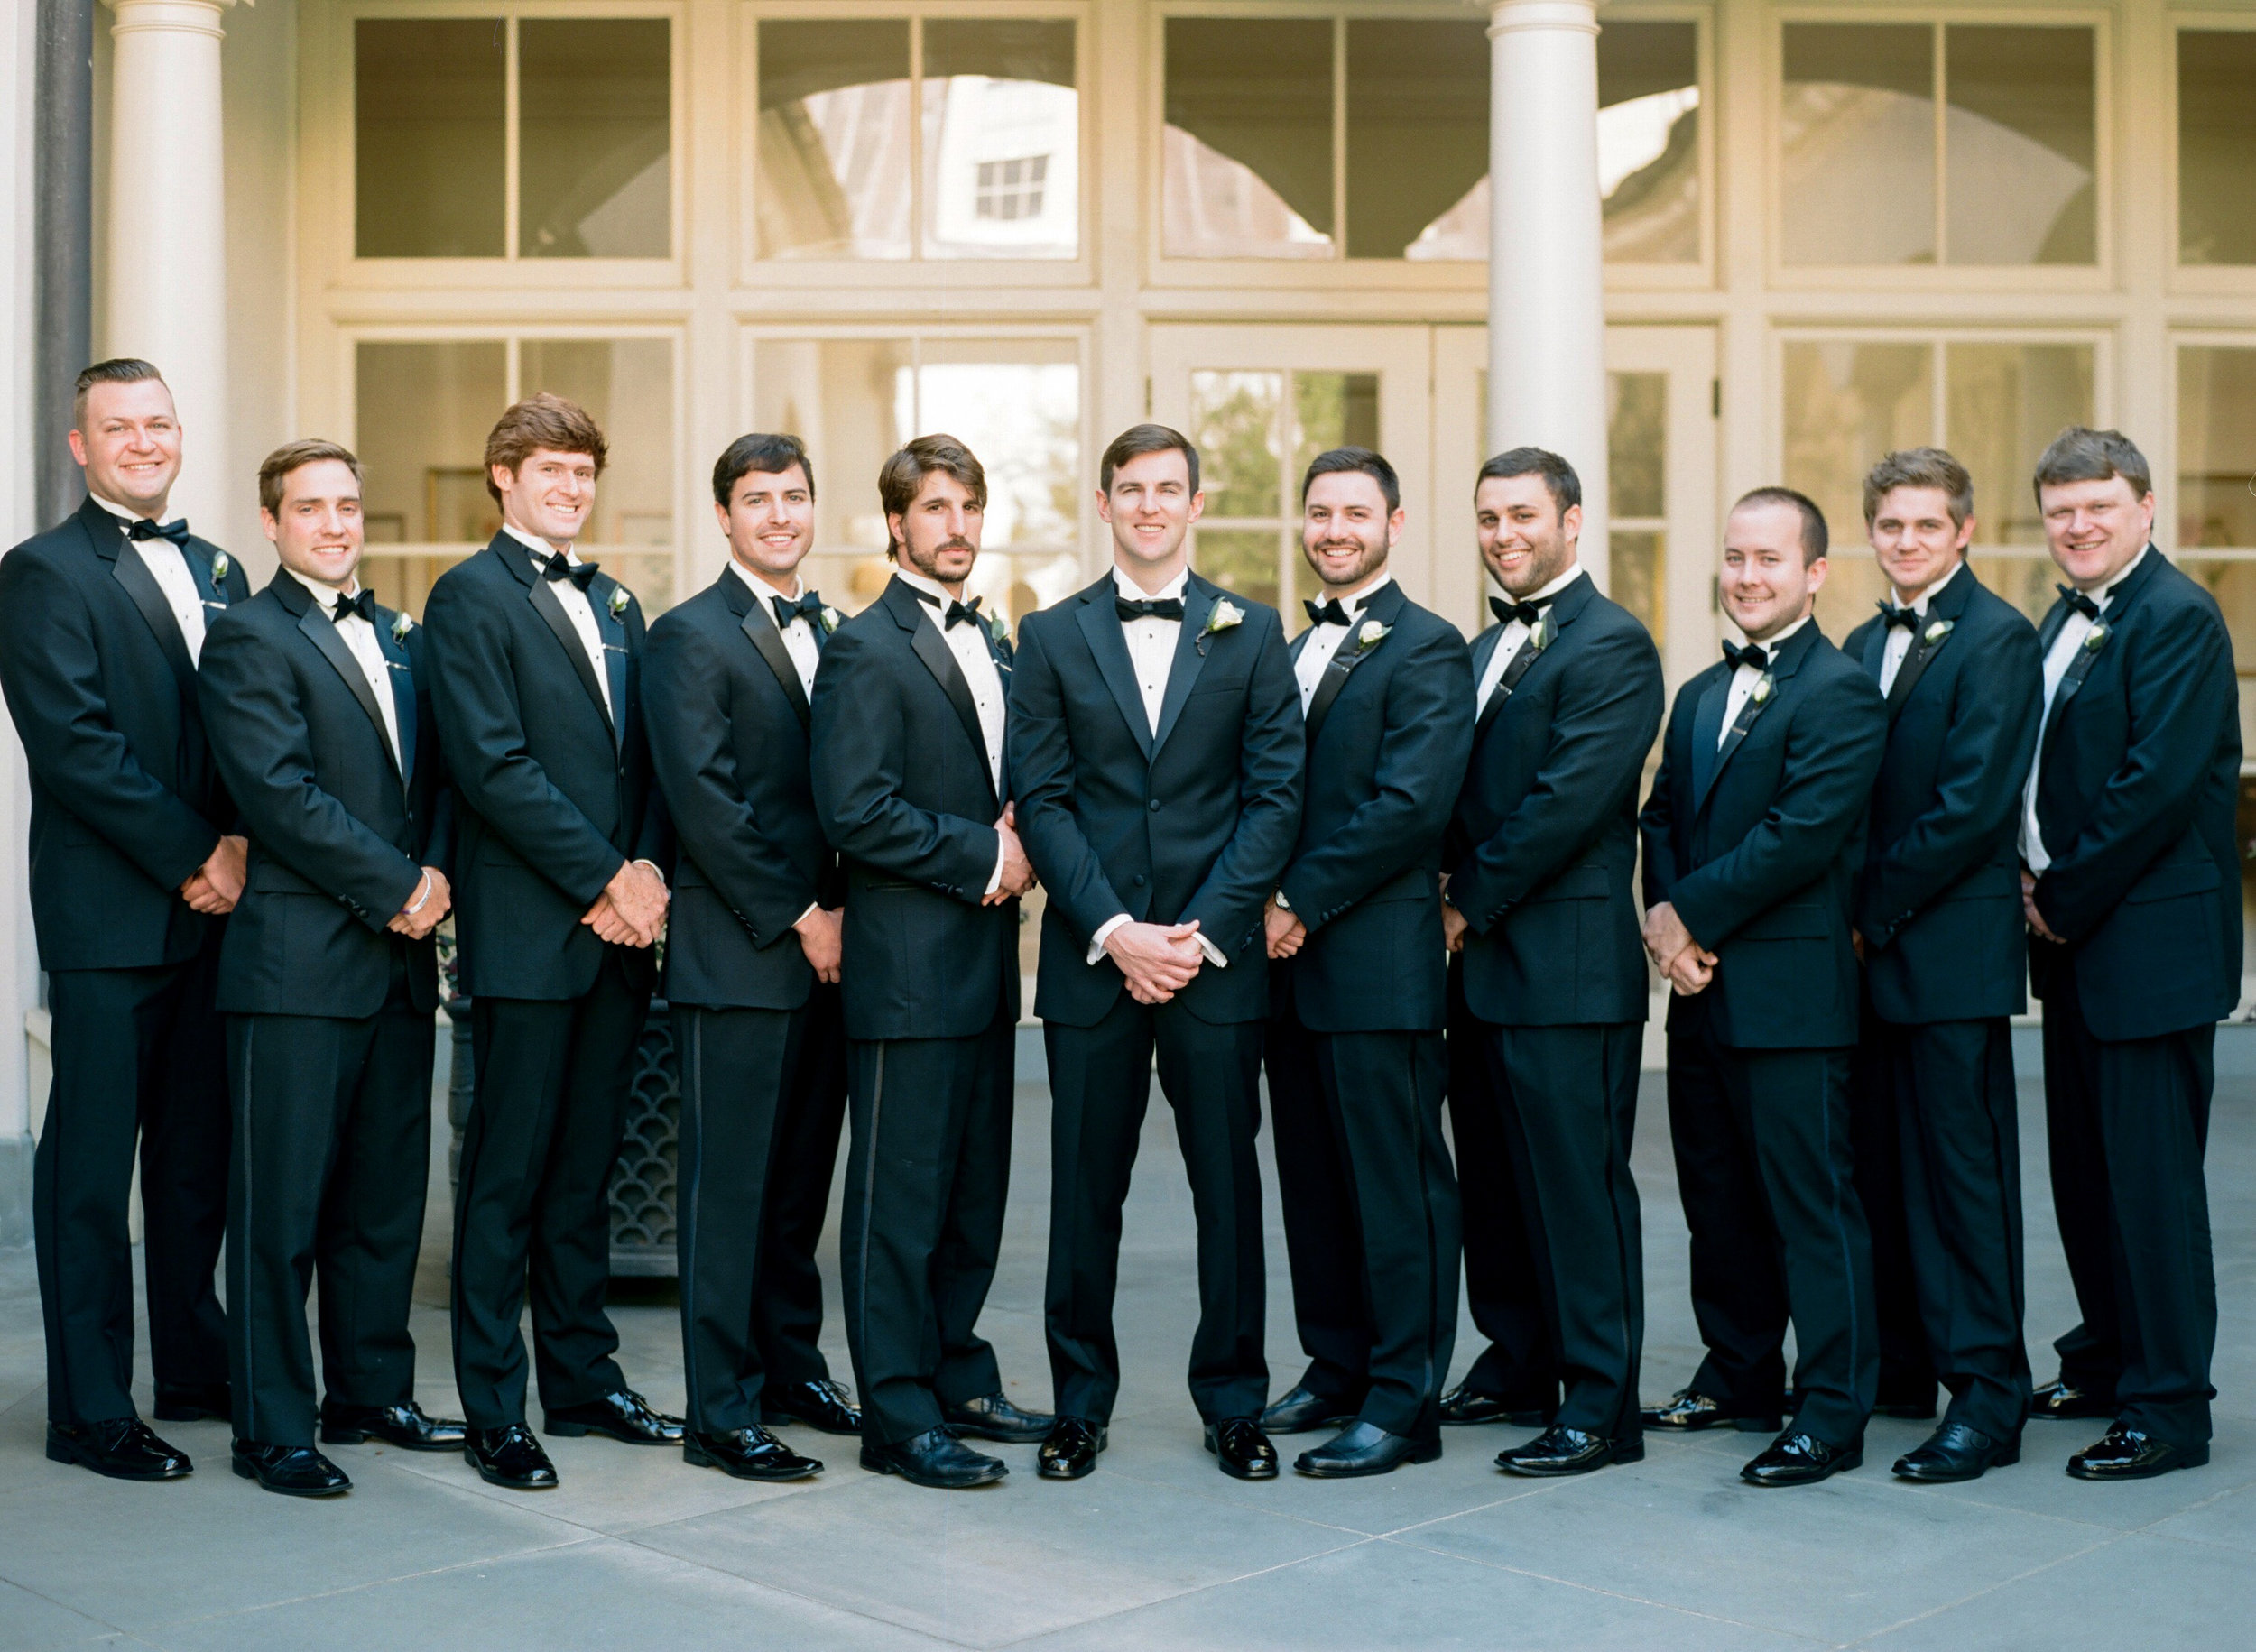 St.-Philip-Presbyterian-Church-Houston-Wedding-Ceremony-The-Junior-League-Of-Houston-Reception-Dana-Fernandez-Photography-Fine-Art-Film-10.jpg